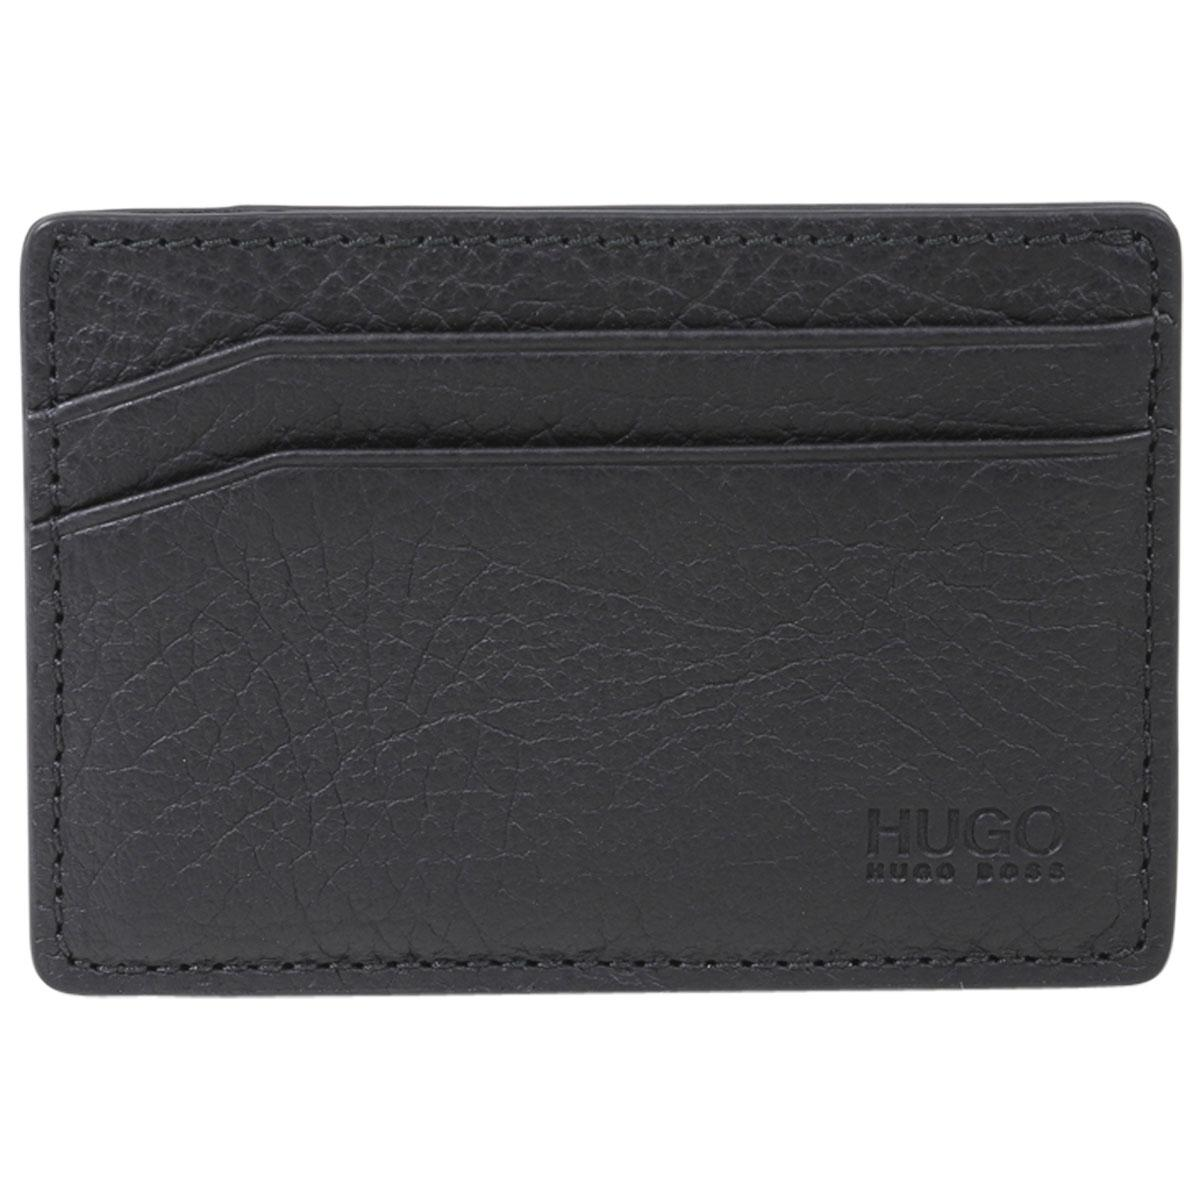 Hugo Boss Men's Victorian Genuine Leather Money Clip Wallet